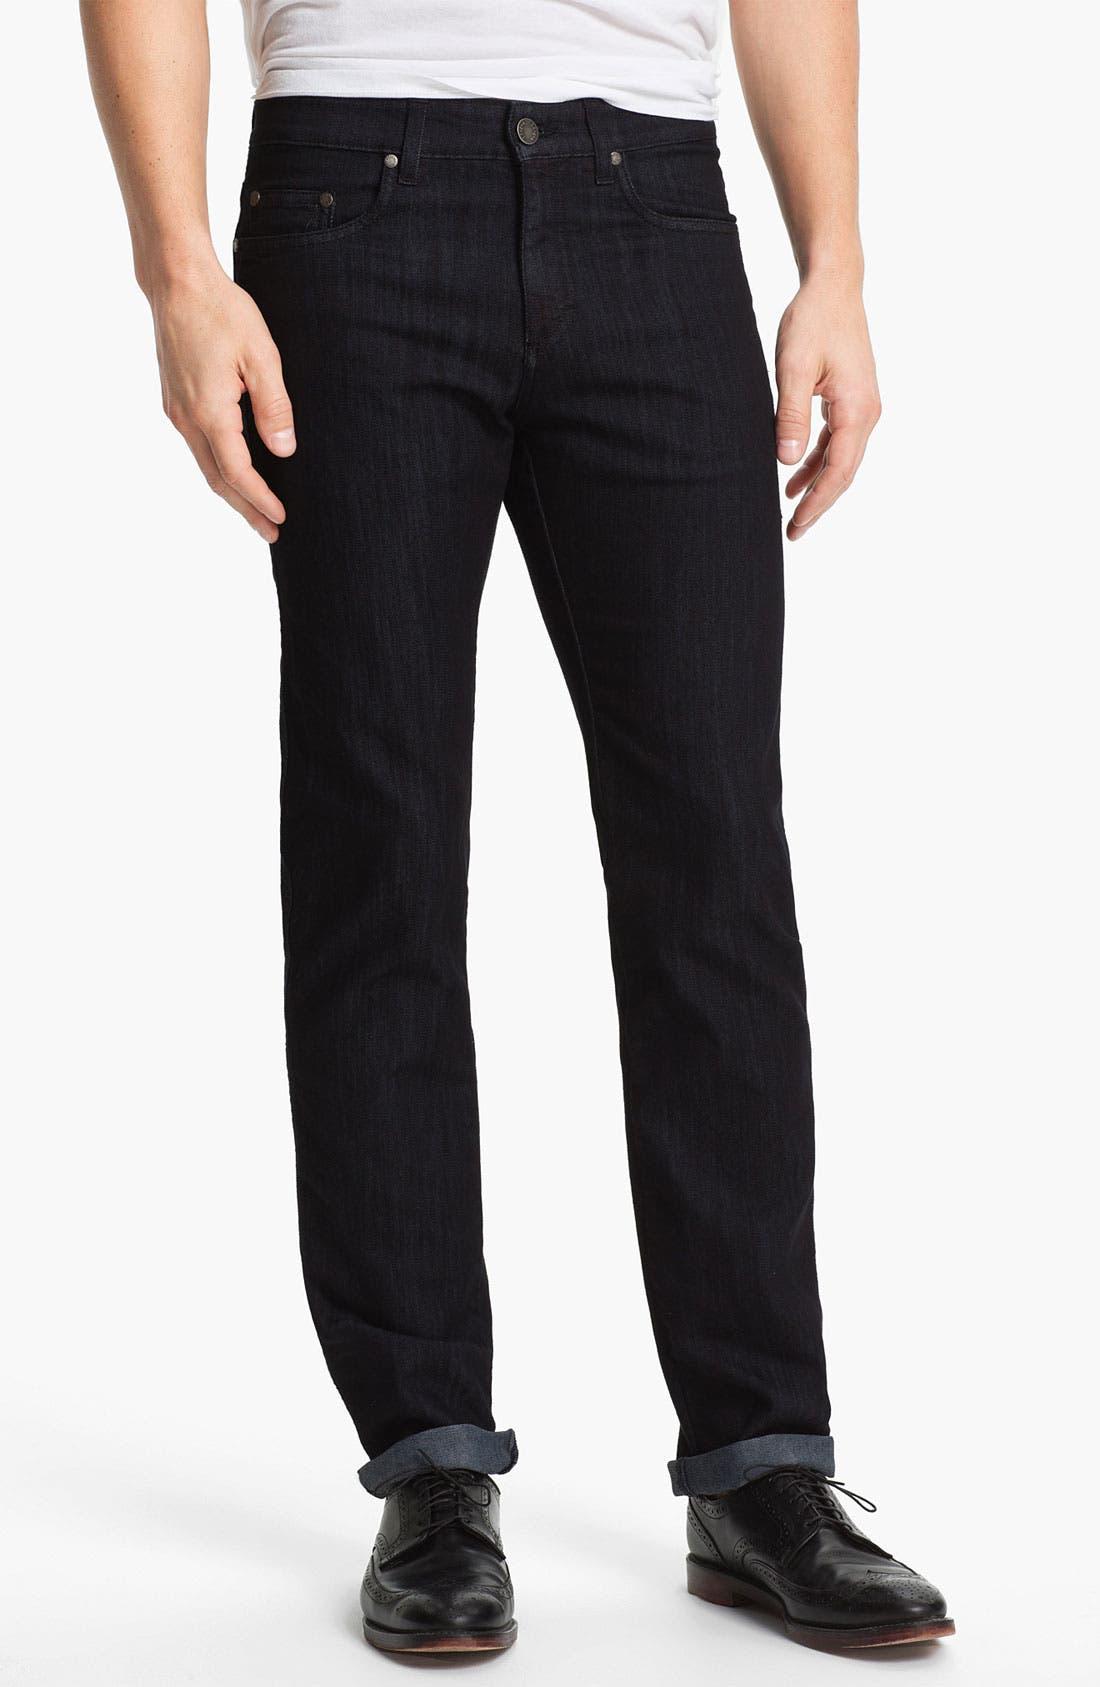 Main Image - Z Zegna 'Metalized Effect' Straight Leg Jeans (Black)